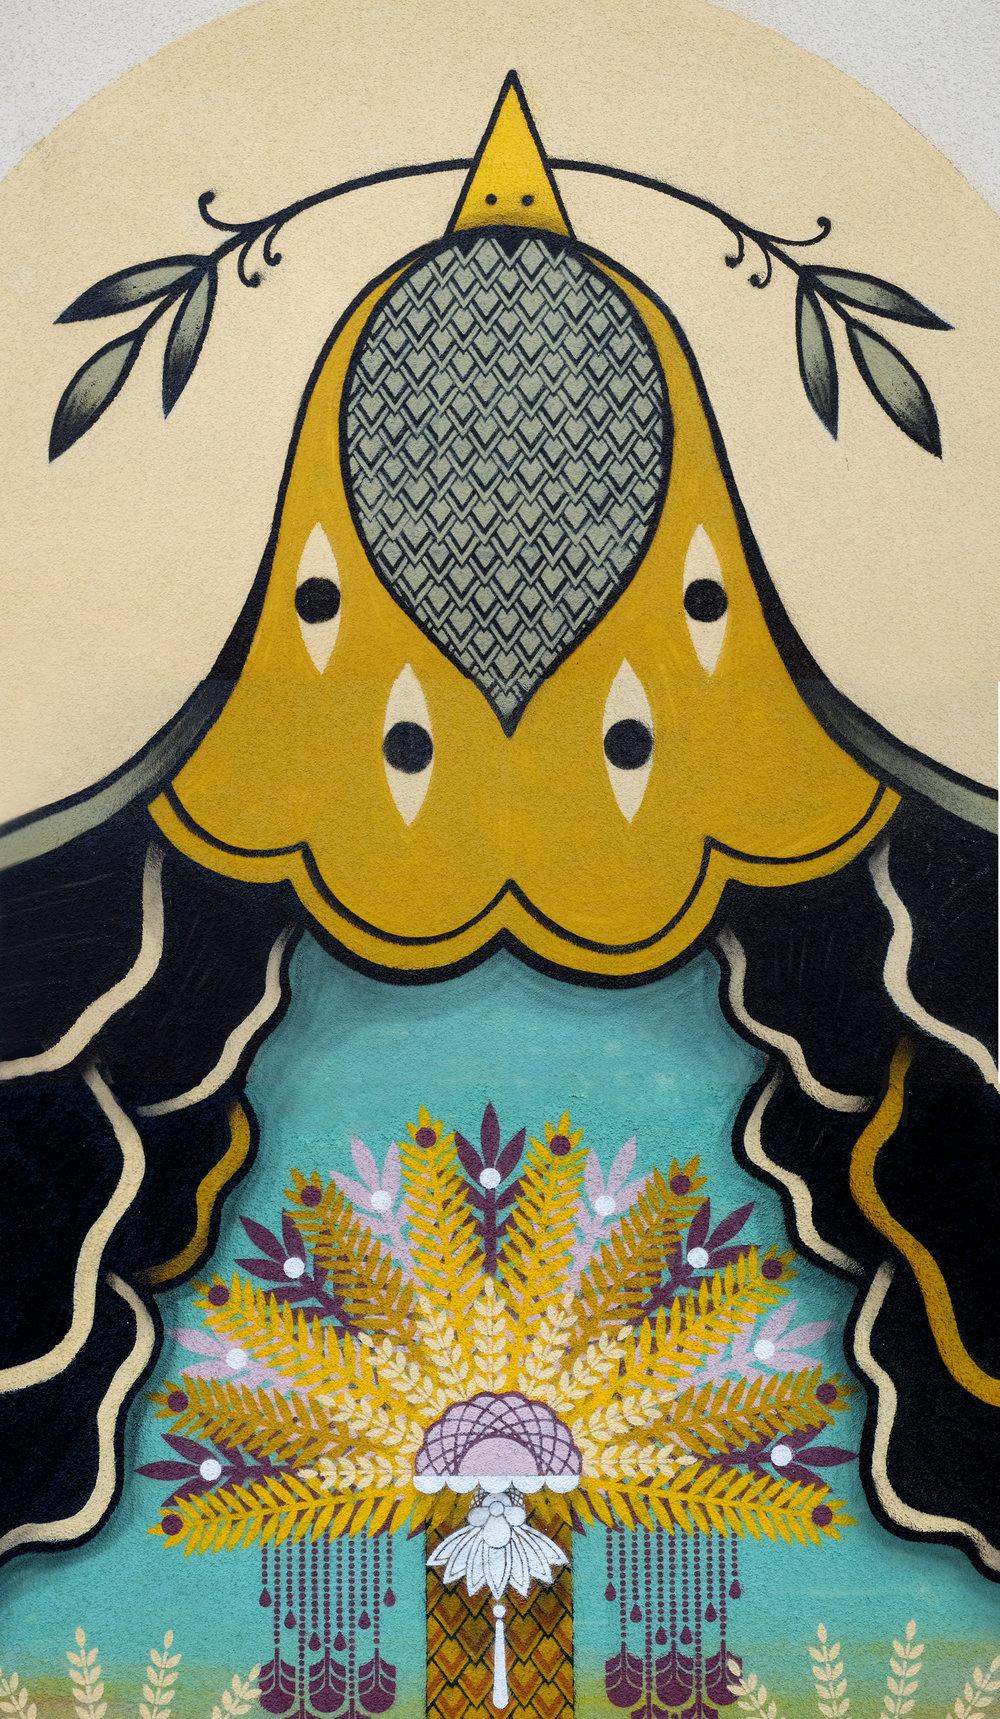 Bird, palm heart  - Artscape Festival, Götheborg - SWEDEN | 2016 w/ SupaKitchh